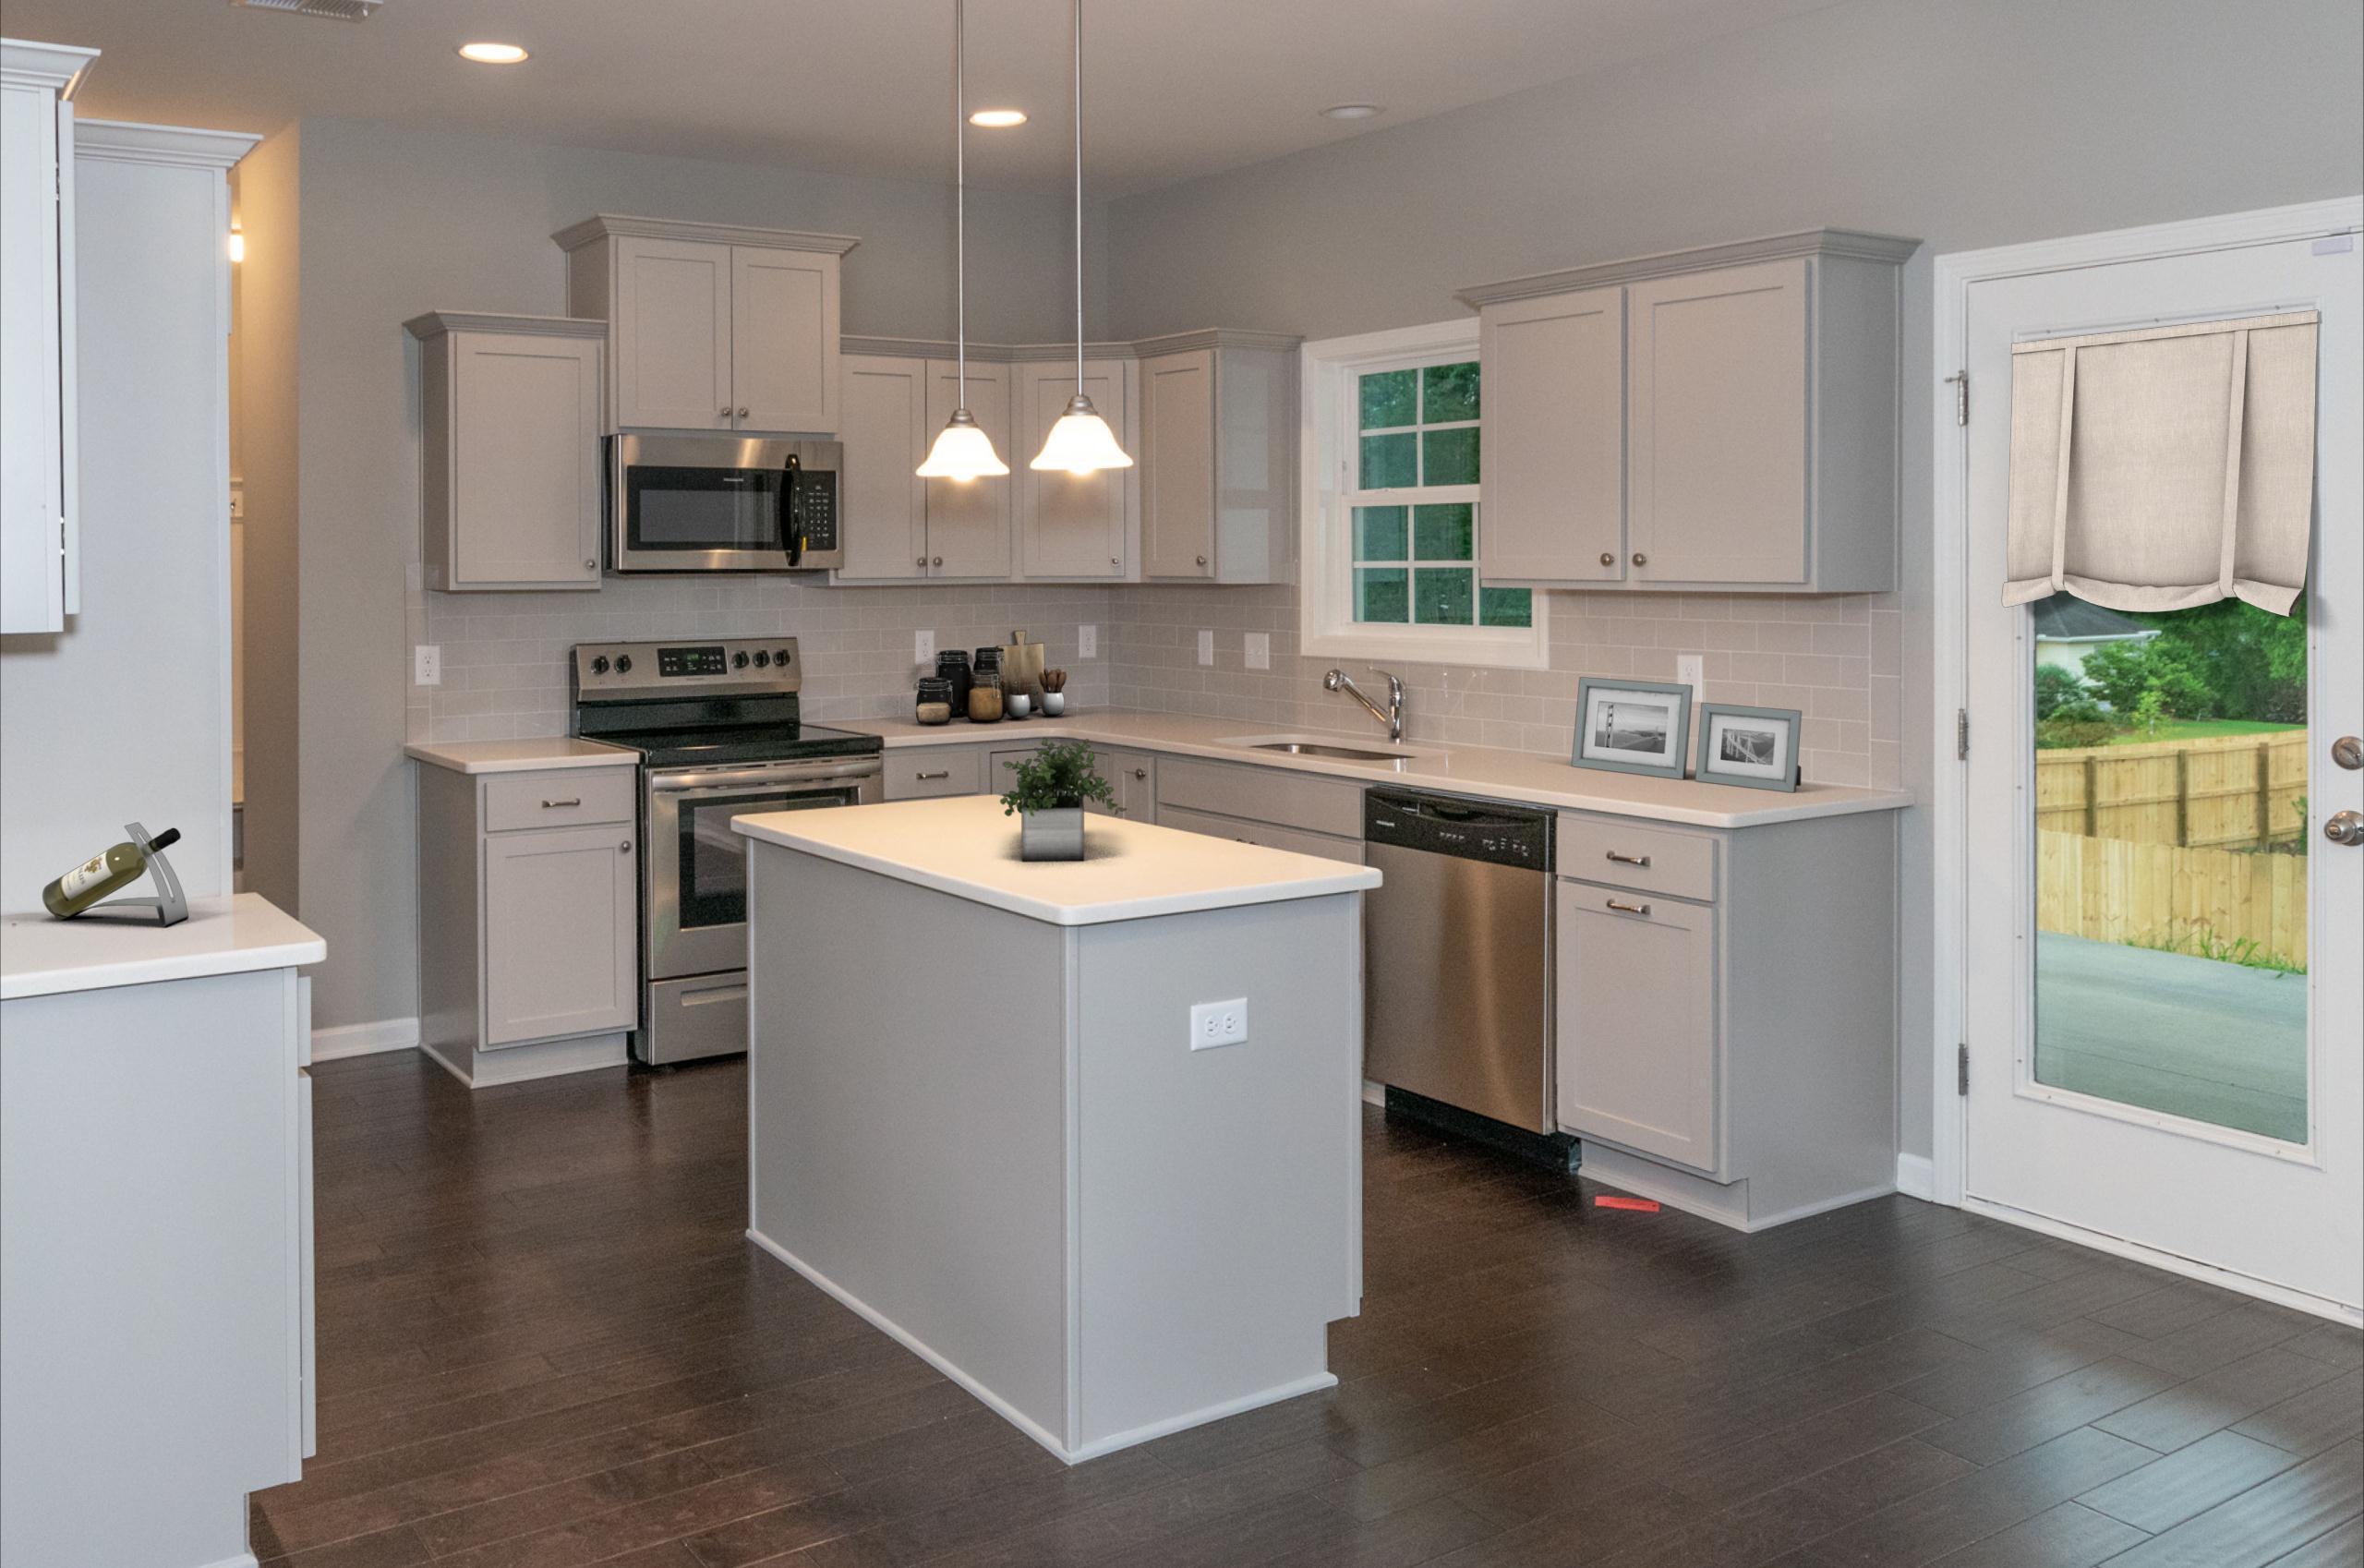 Kitchen featured in the Harrison By Hughston Homes in Atlanta, GA